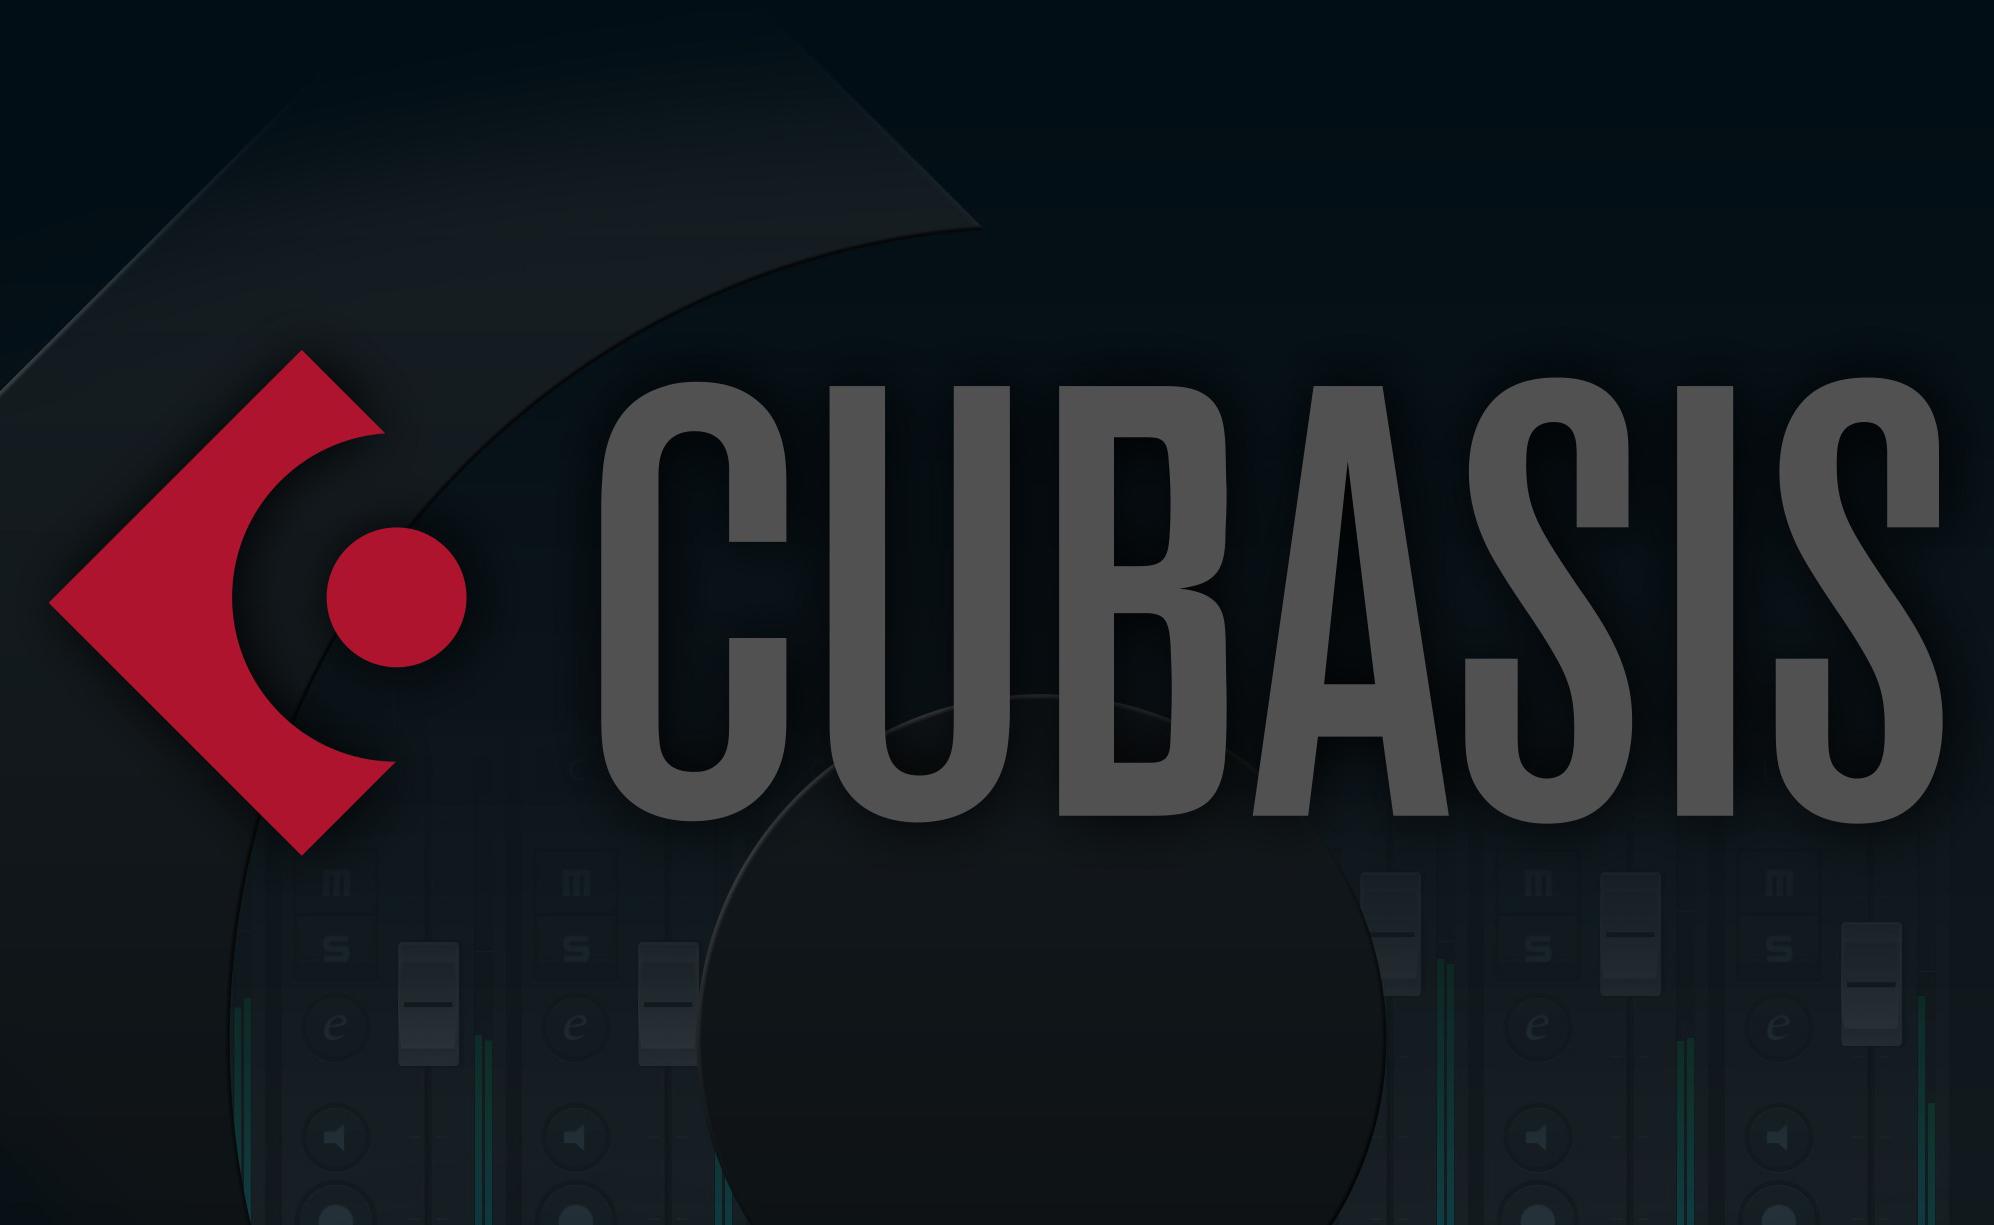 Cubasis logo